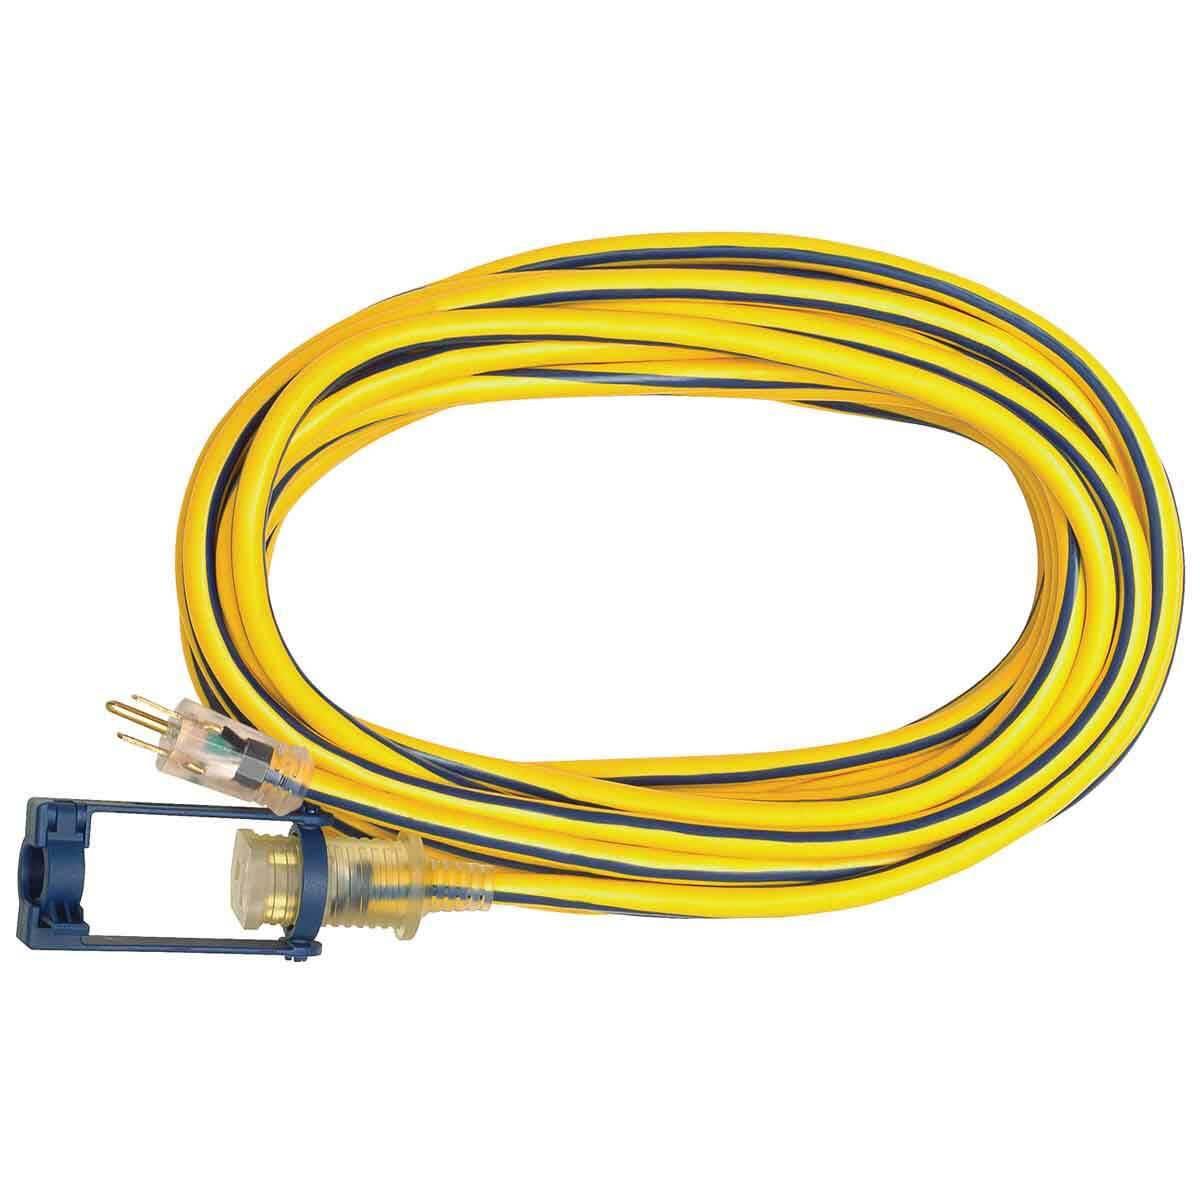 voltec 100ft extension cord